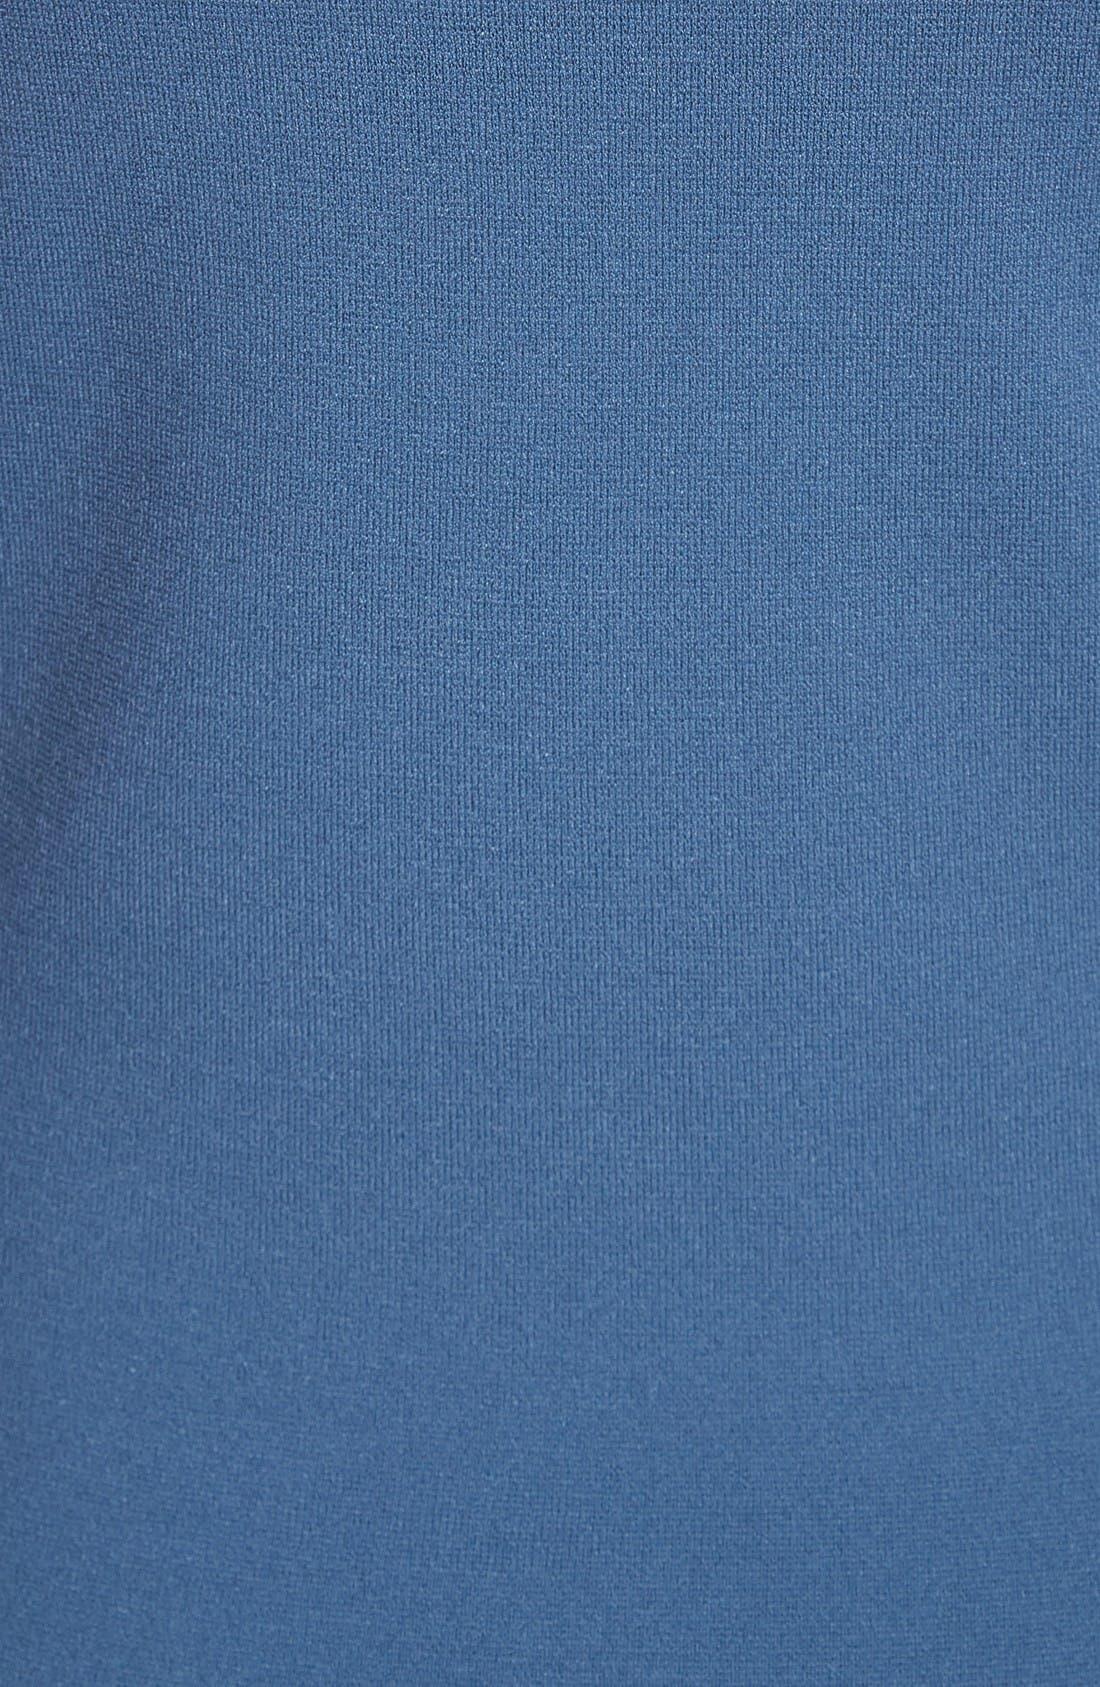 Knit Tank Dress,                             Alternate thumbnail 5, color,                             Indigo